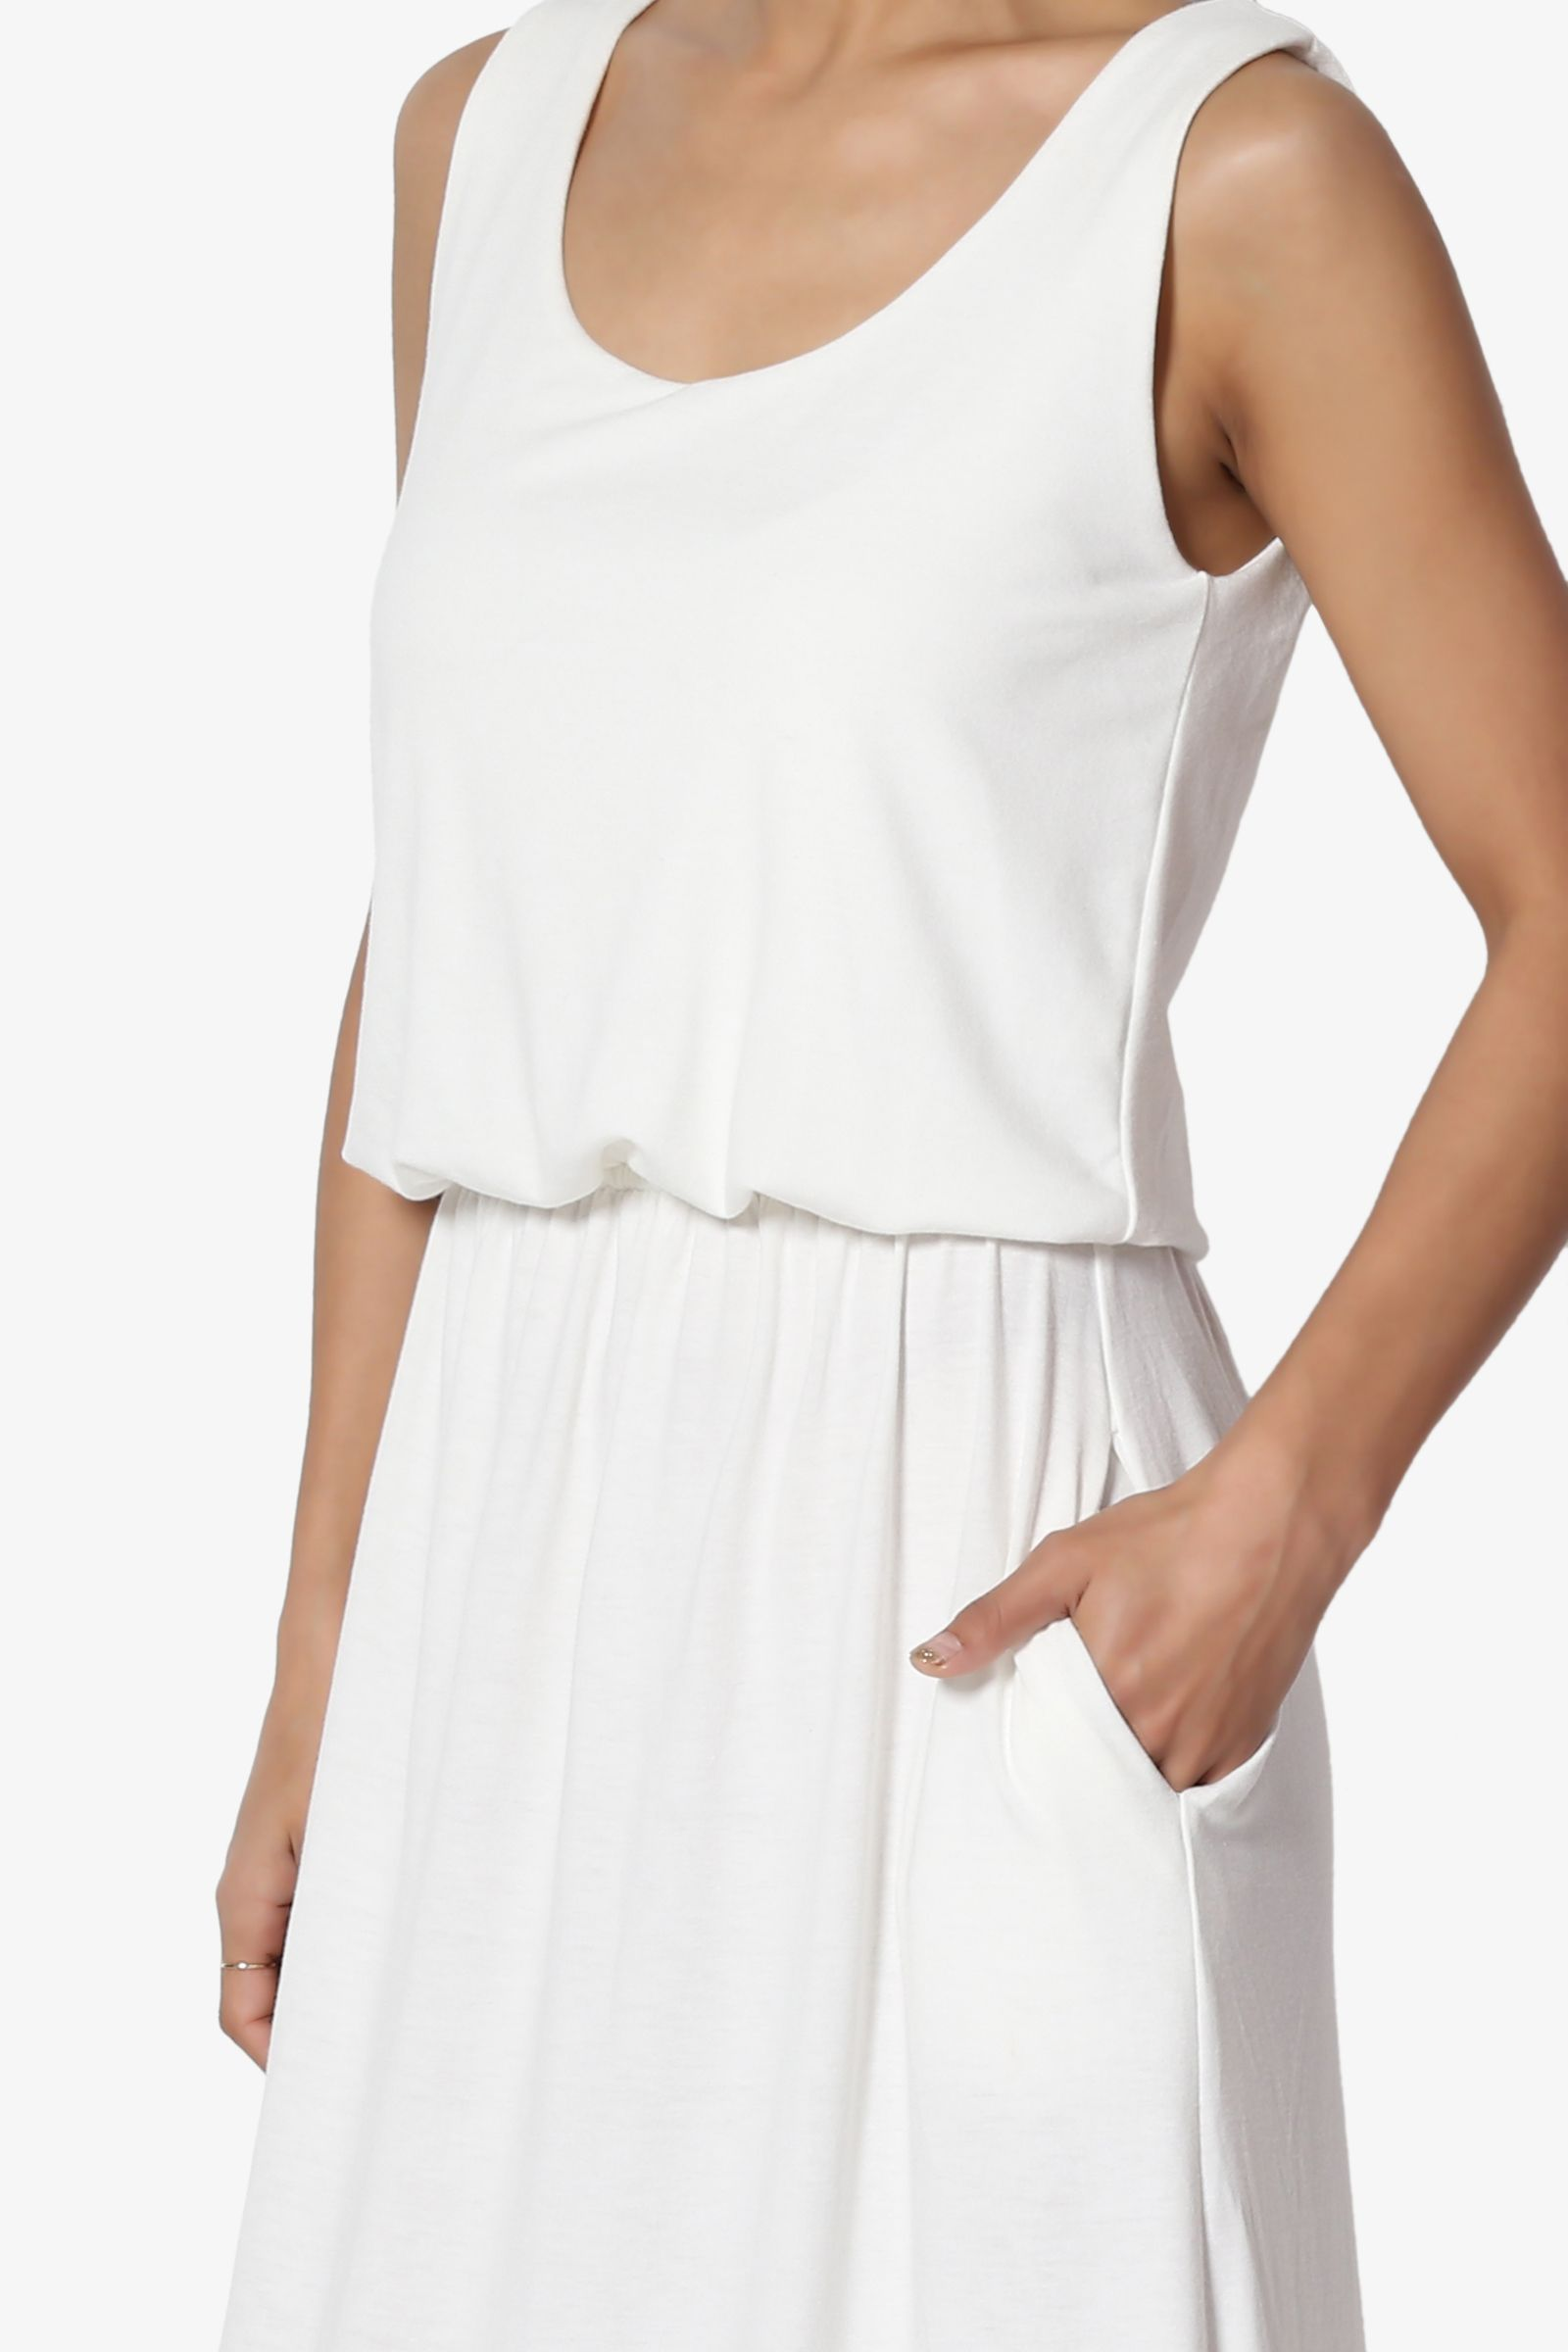 Themogan Themogan Women S S 3x Sleeveless Scoop Neck Blouson Tank Top Long Skirt Maxi Dress Walmart Com Long Skirt Maxi Dress Sleeveless [ 2400 x 1600 Pixel ]